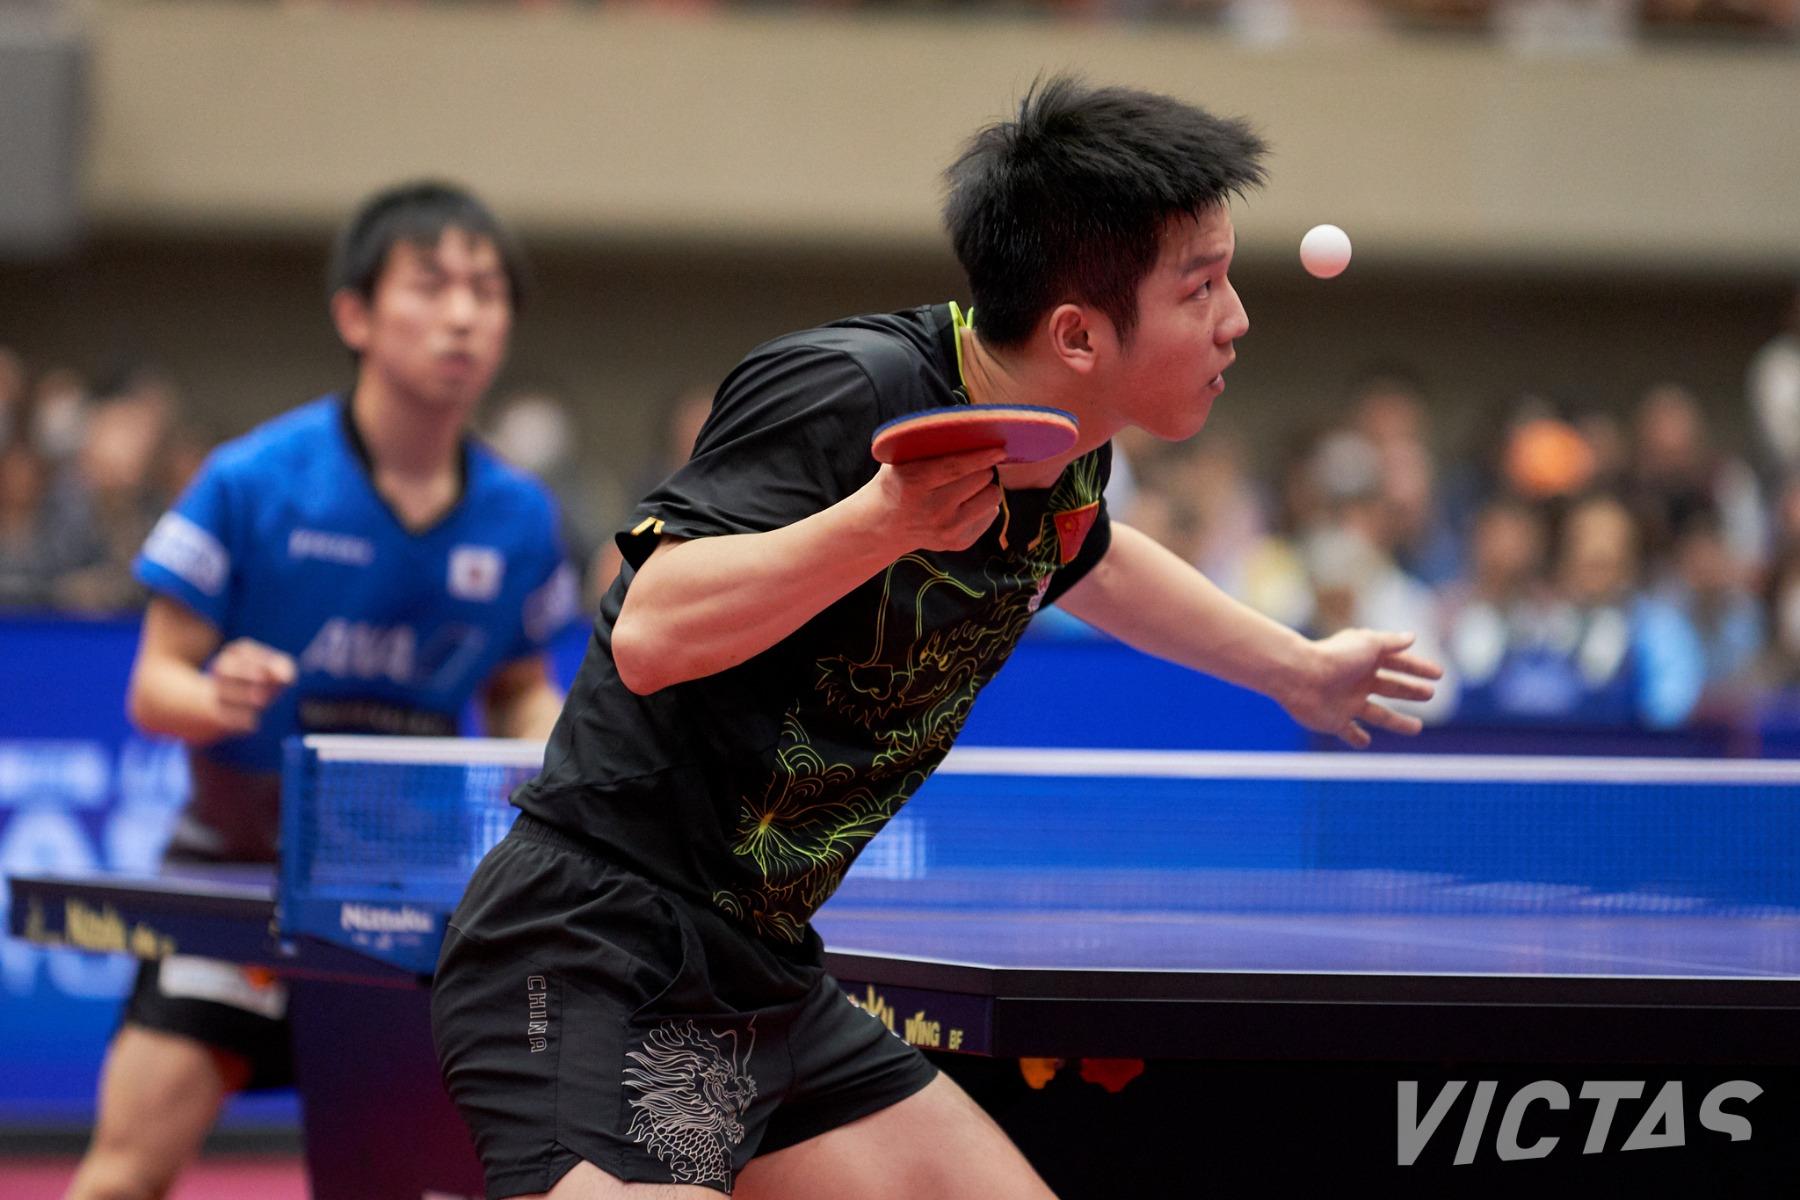 LION ITTF・ATTUアジアカップ横浜2018 男子2日目 結果 World Report:Journal/ インフォメーション |  VICTAS卓球用品メーカー